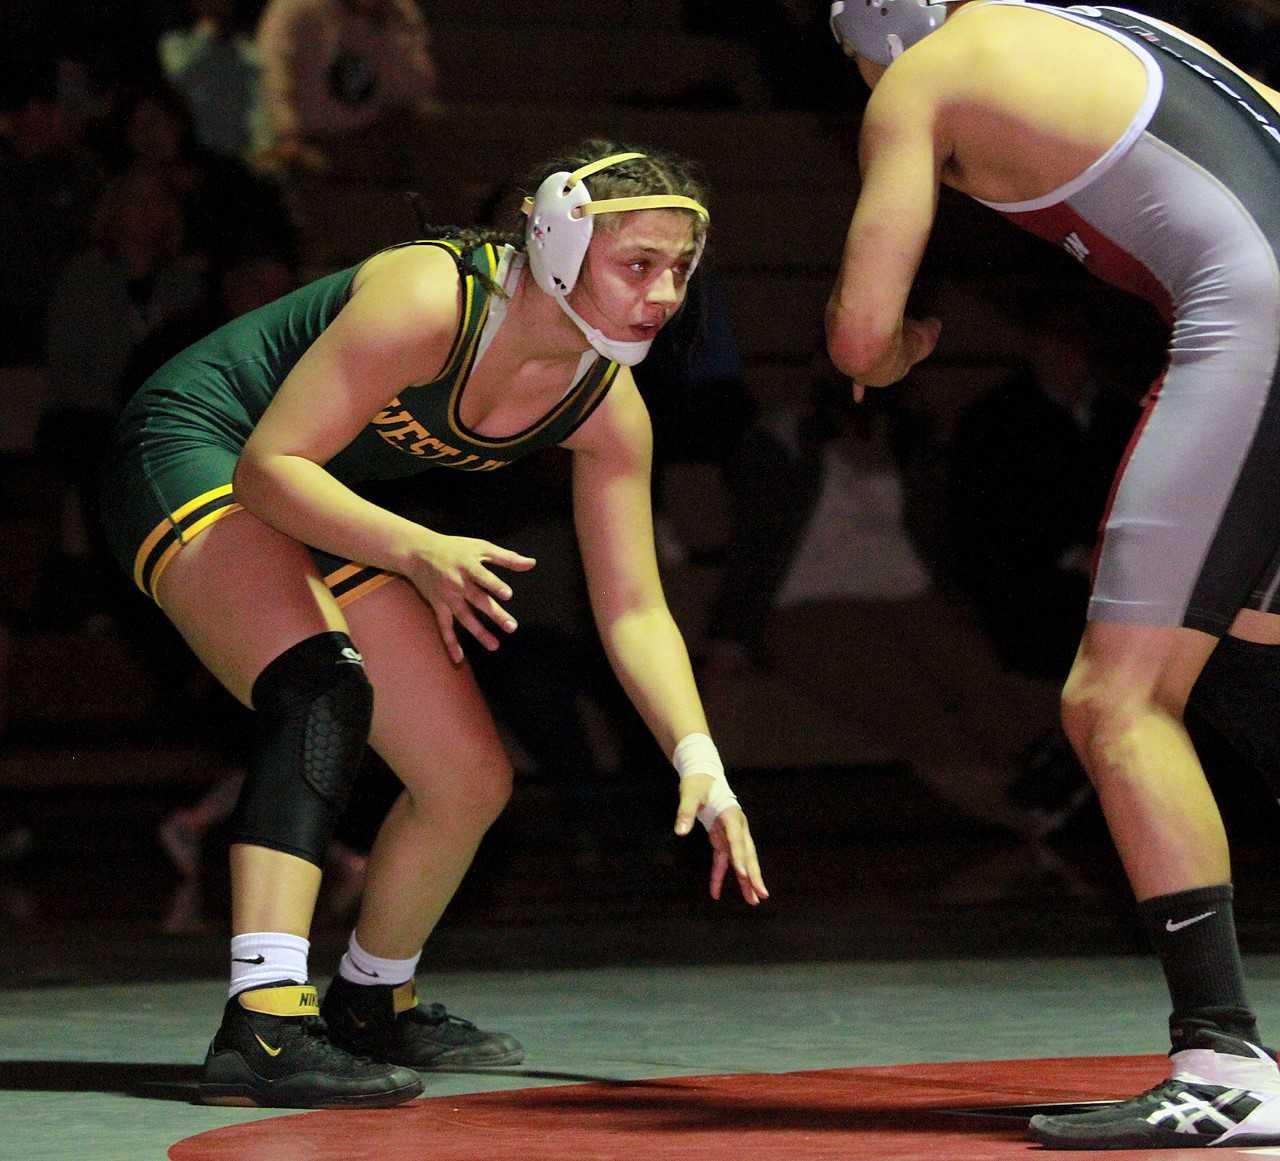 Destiny Rodriguez has won junior and cadet national titles at Fargo. (Courtesy photo: Pamplin Media Group)